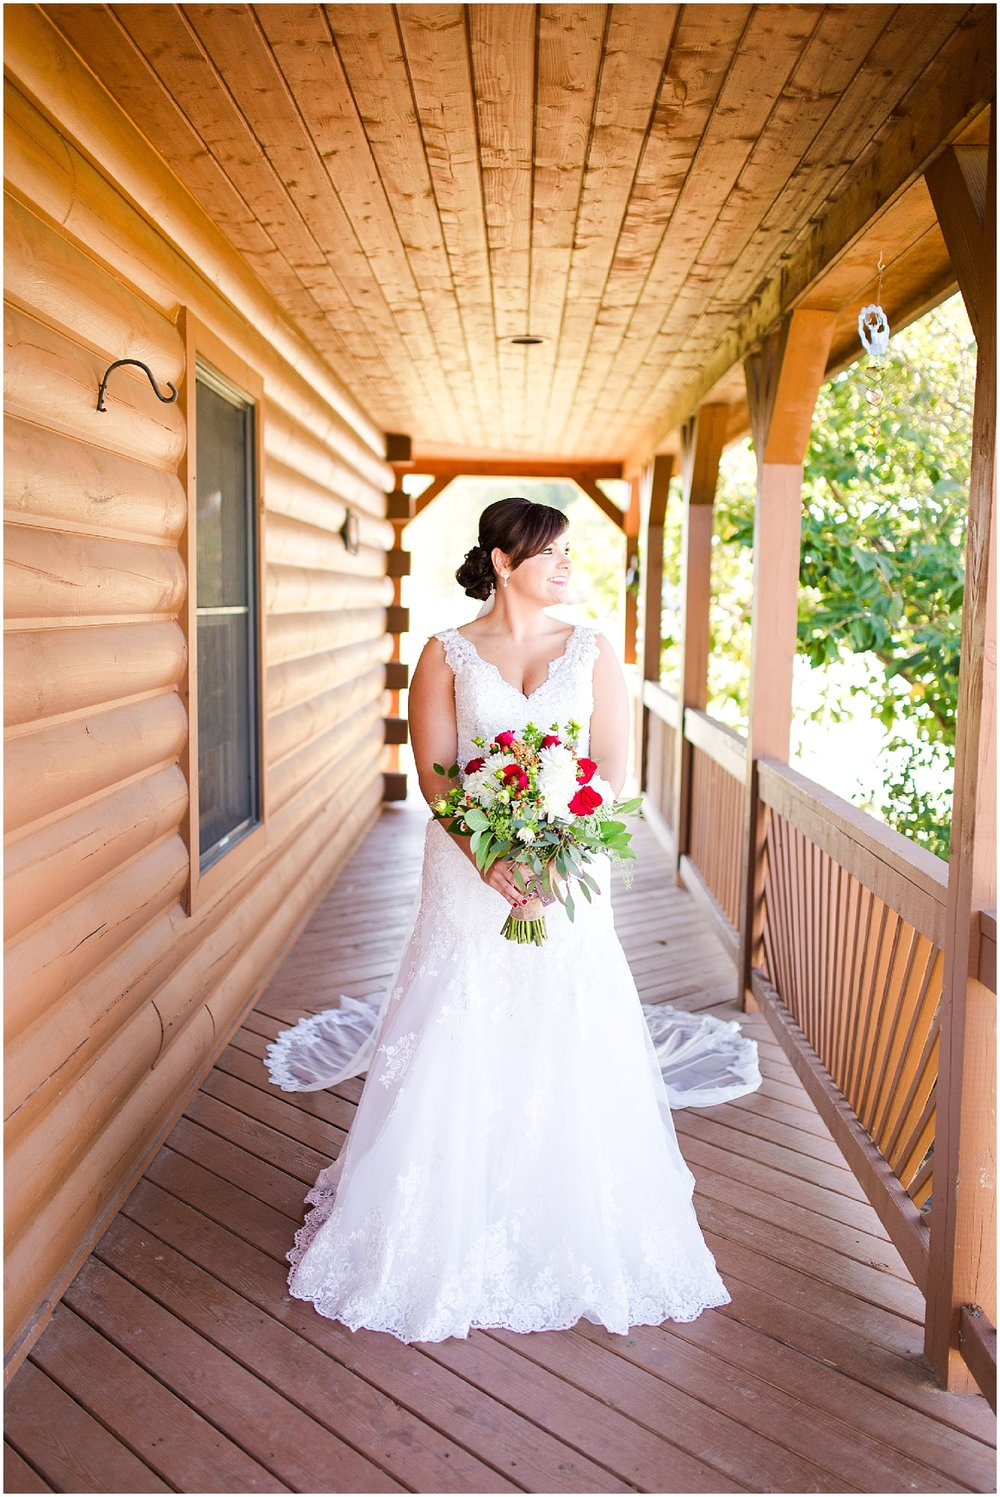 Rustic Country Wedding Virginia Photographer (5).jpg